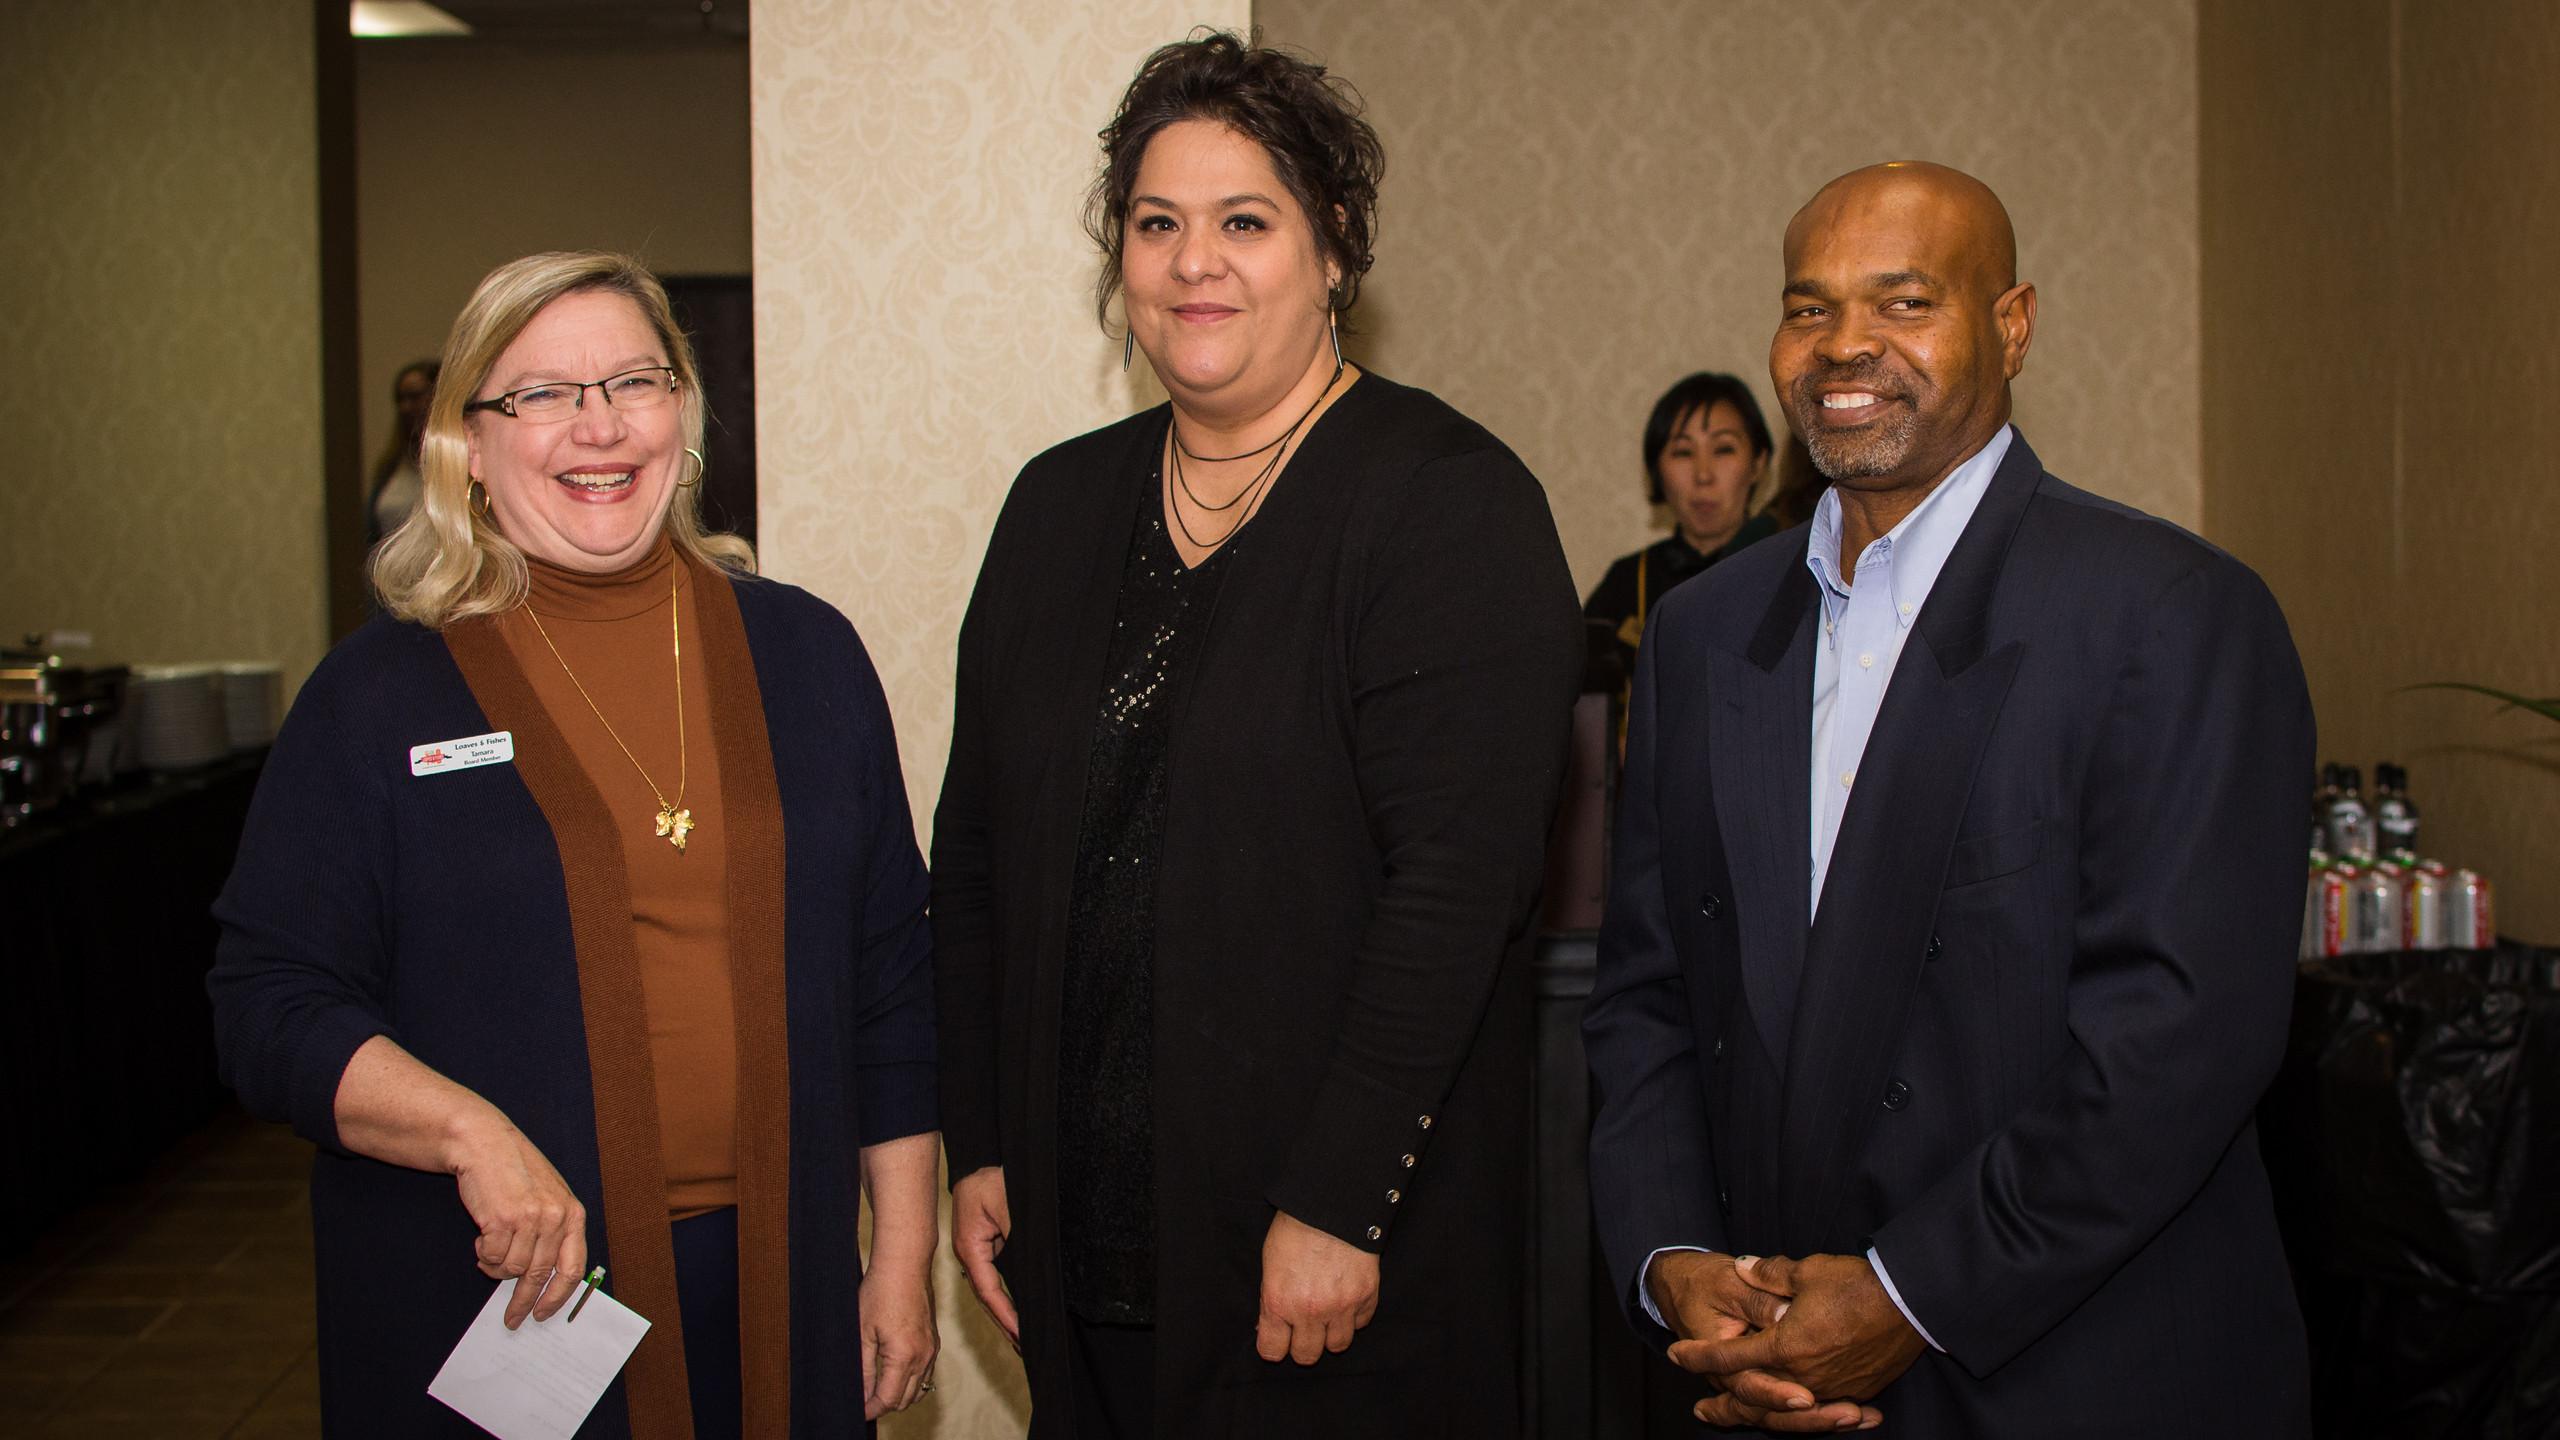 TamaraLong, Patricia Wilkinson, and Issa